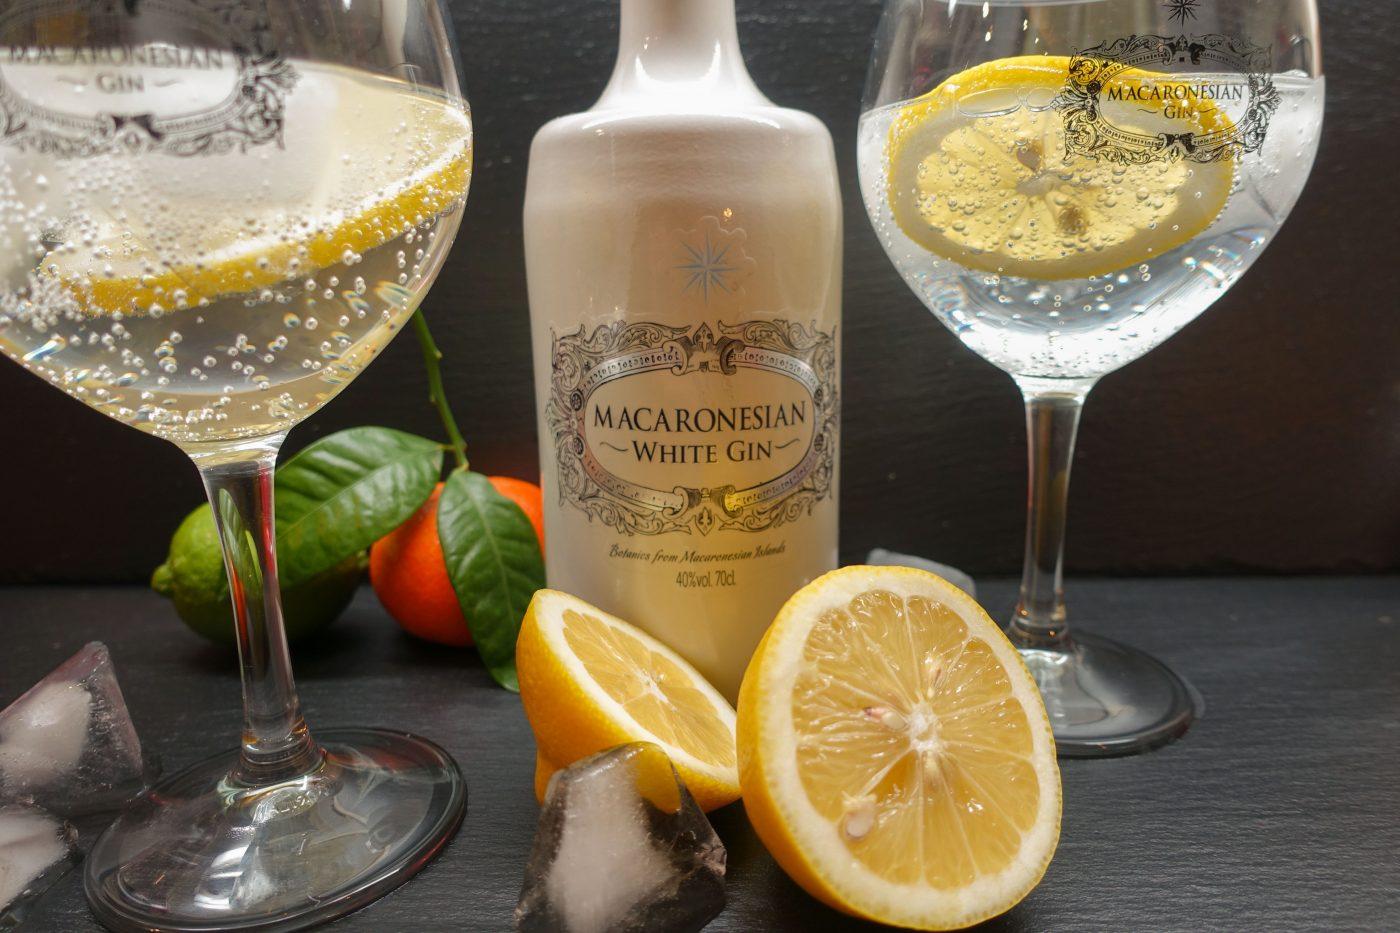 Canarian Macaronesian White Gin